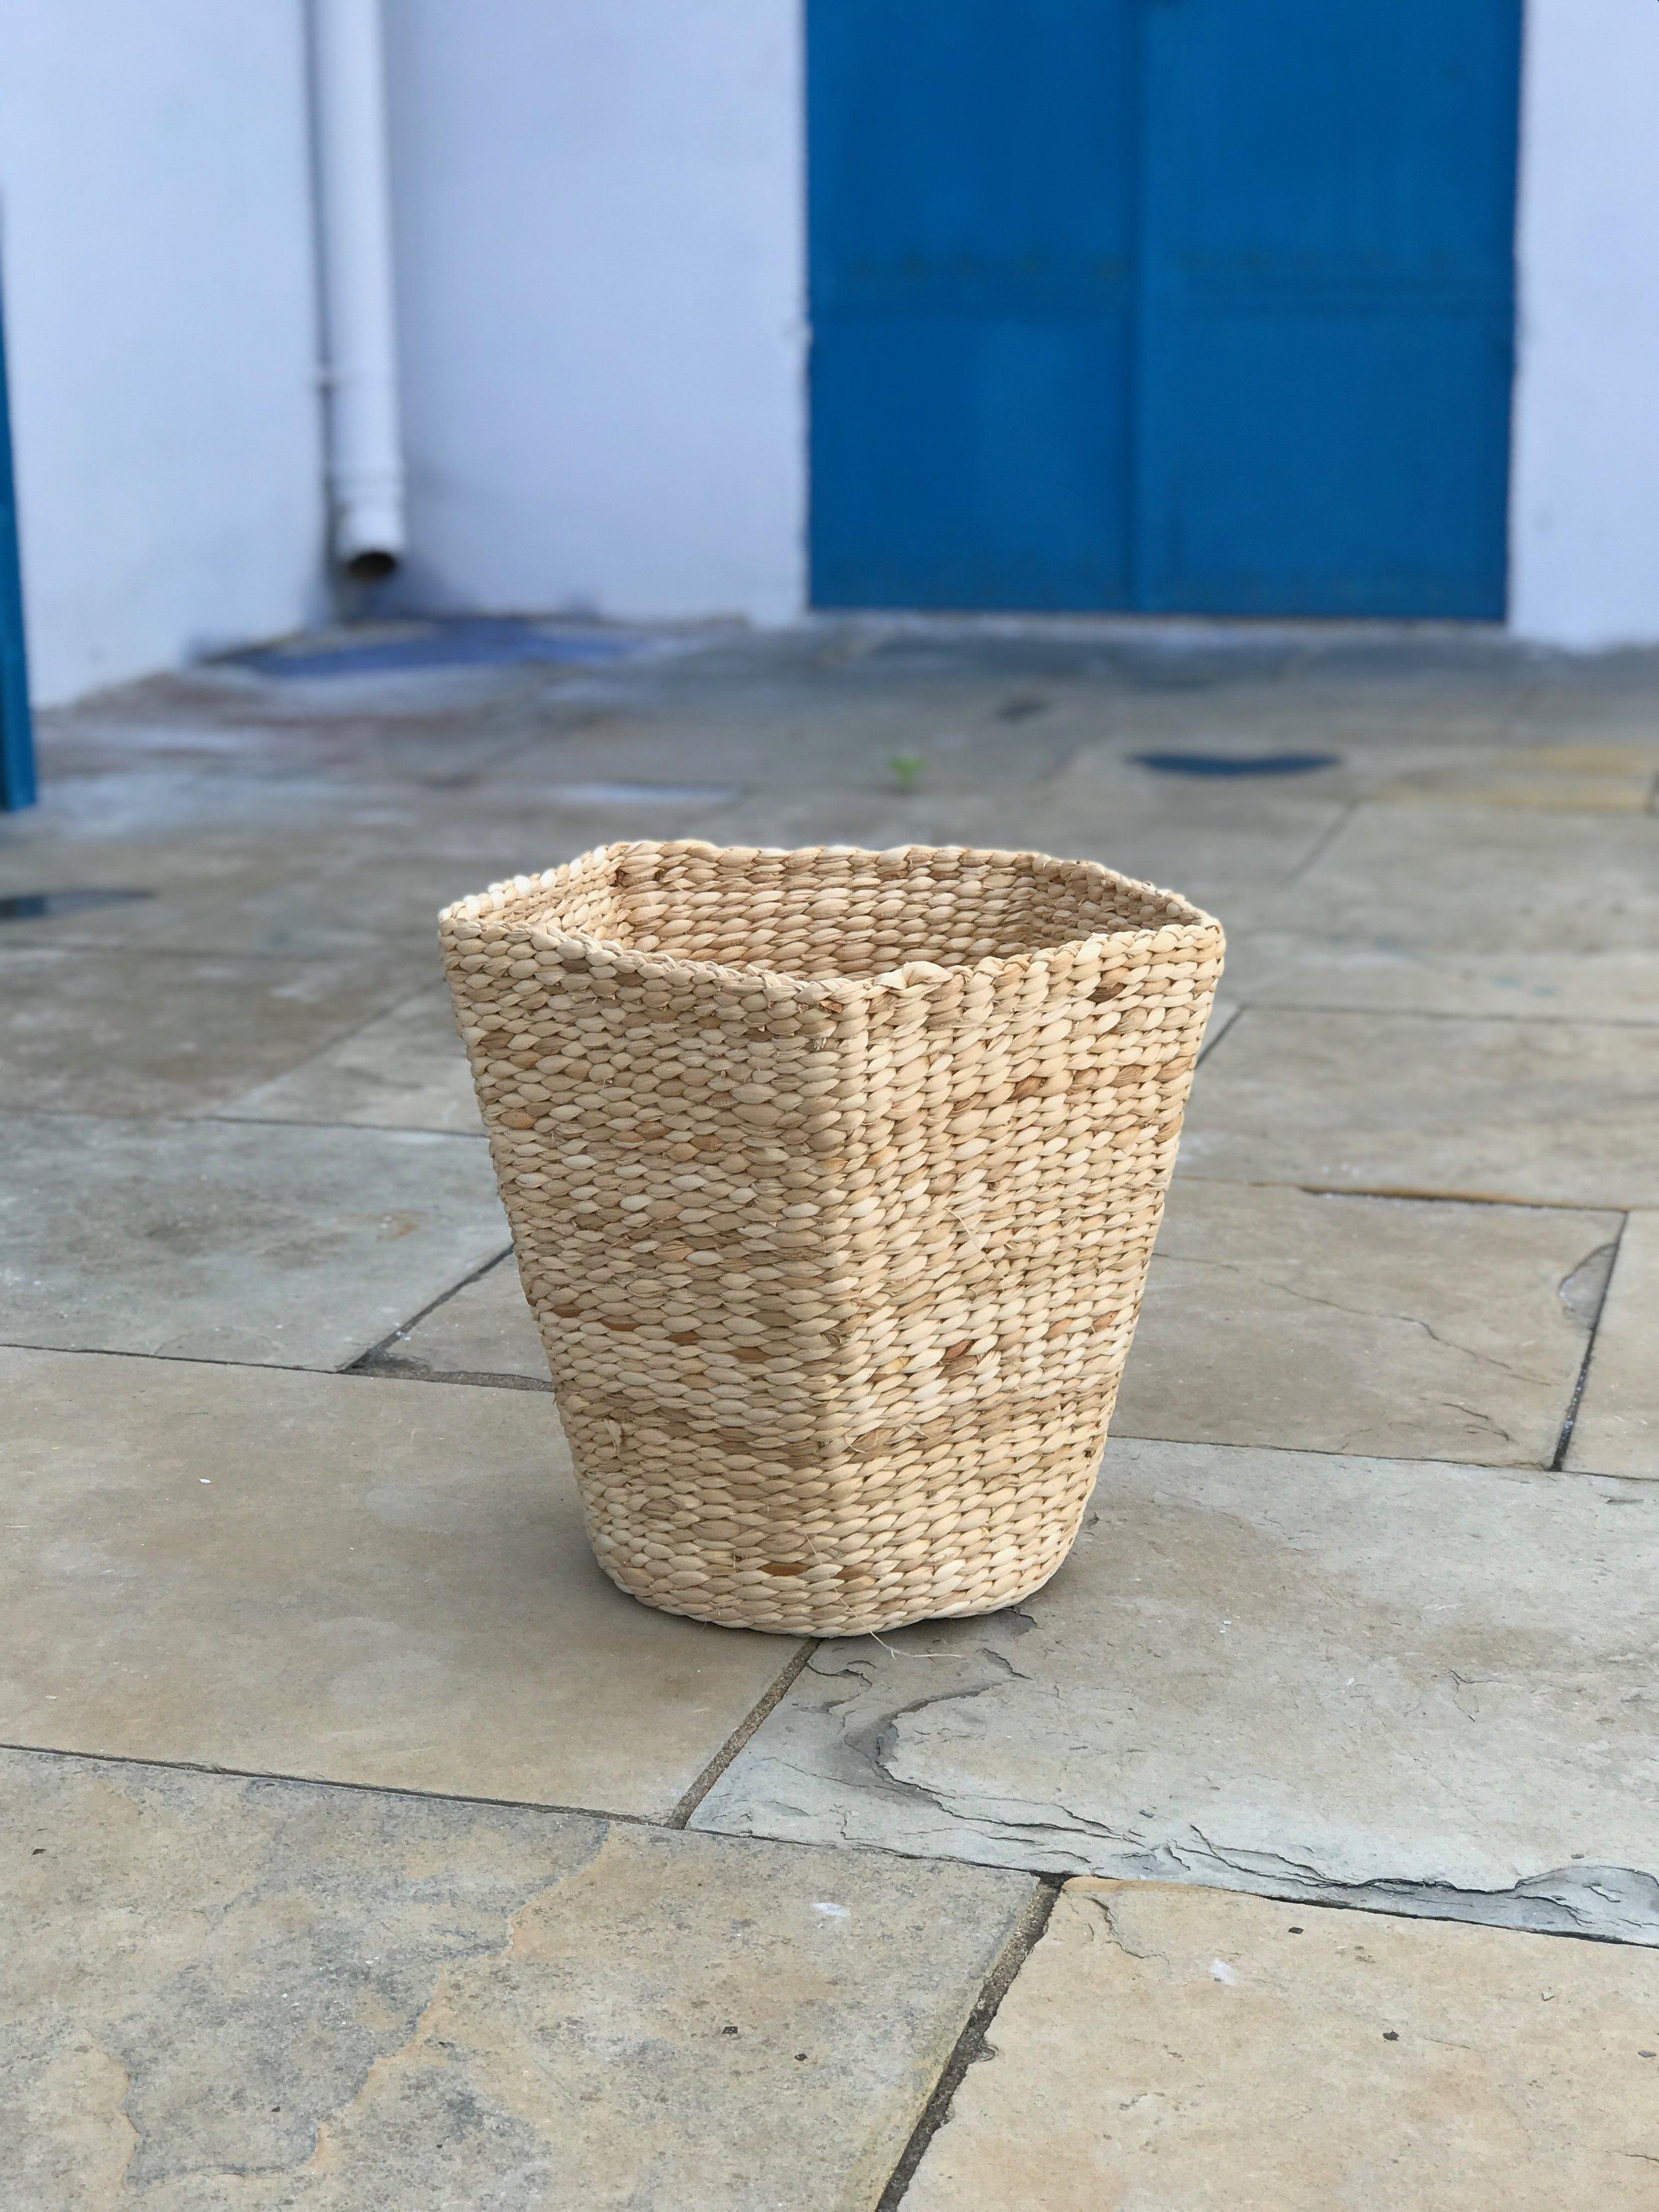 Prototype of the morph basket.